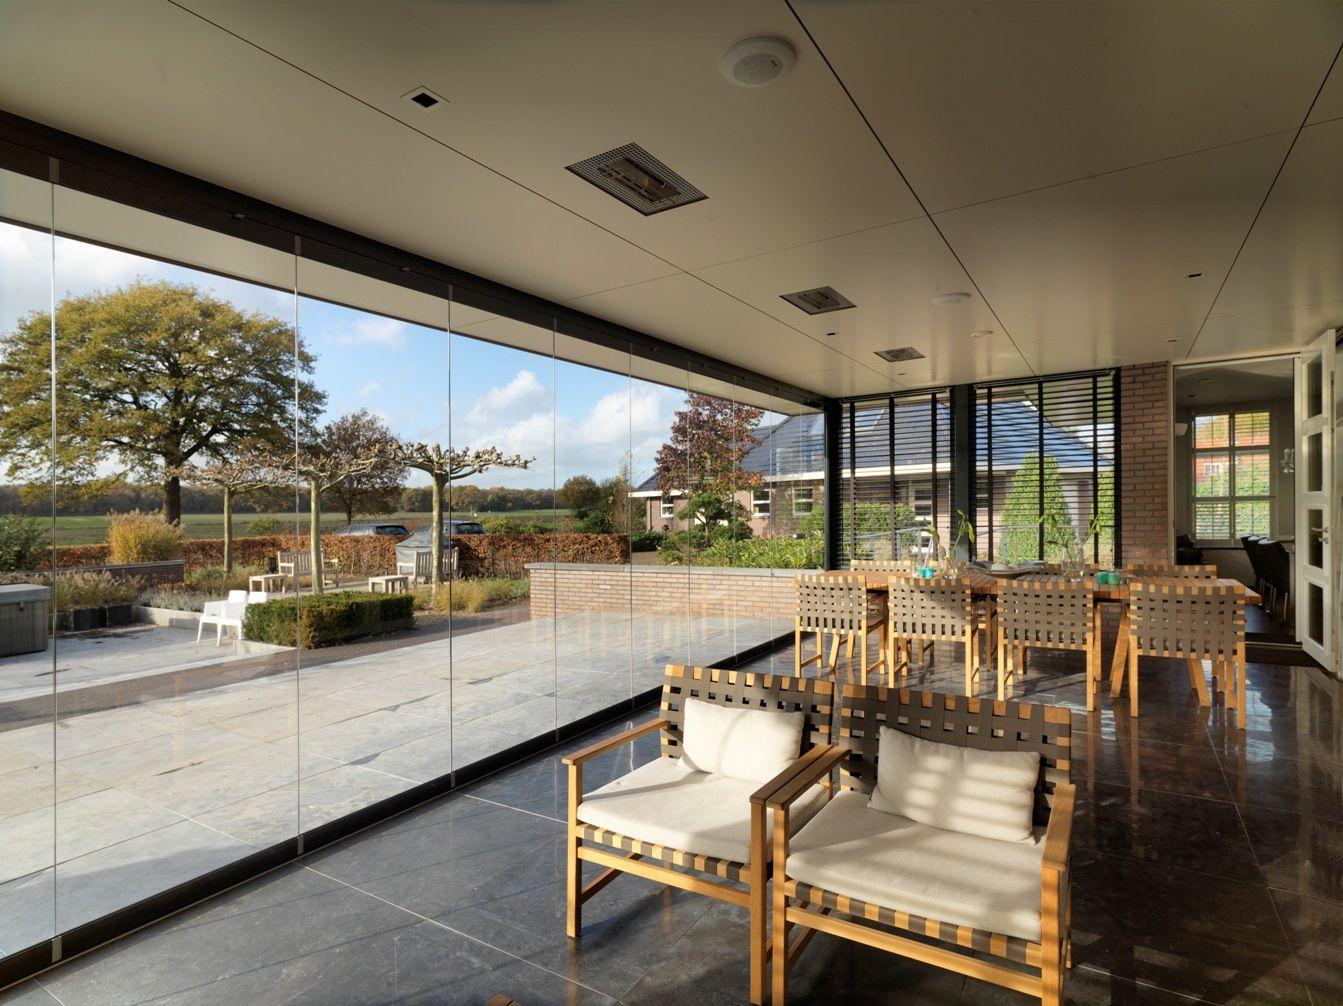 glazen vouwwand solarlux sl 25 om de veranda wind en. Black Bedroom Furniture Sets. Home Design Ideas